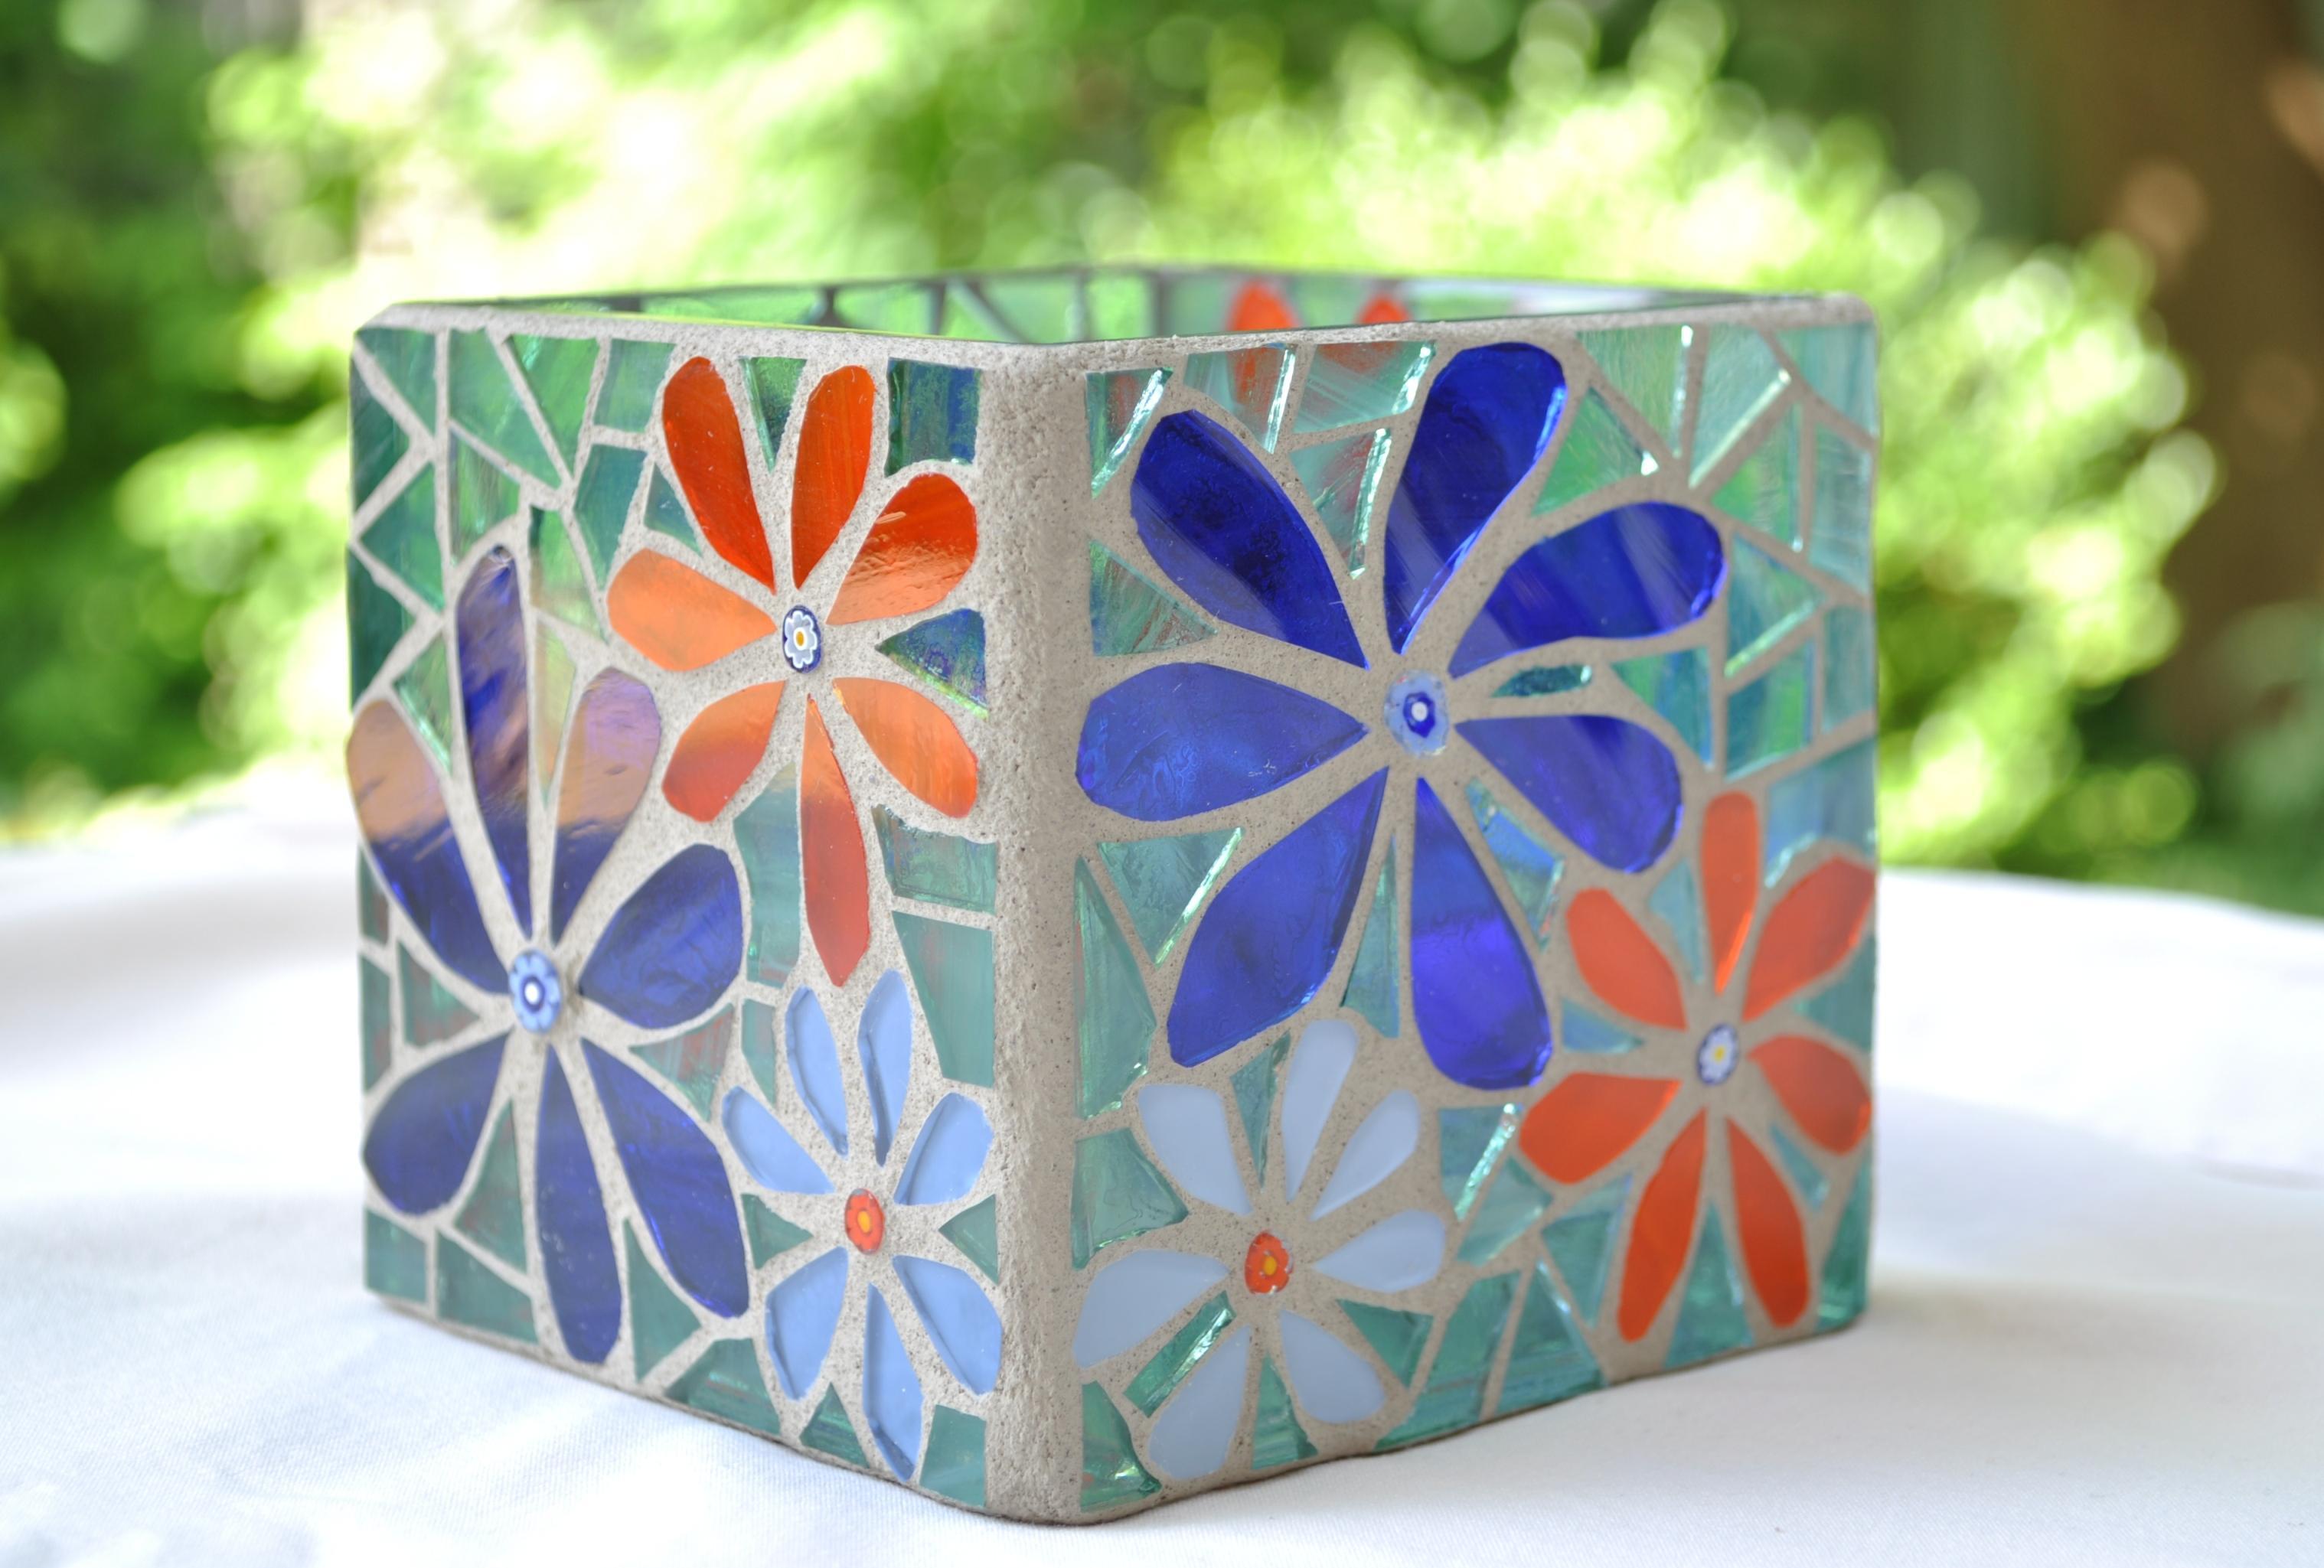 Mosaic Vase Series